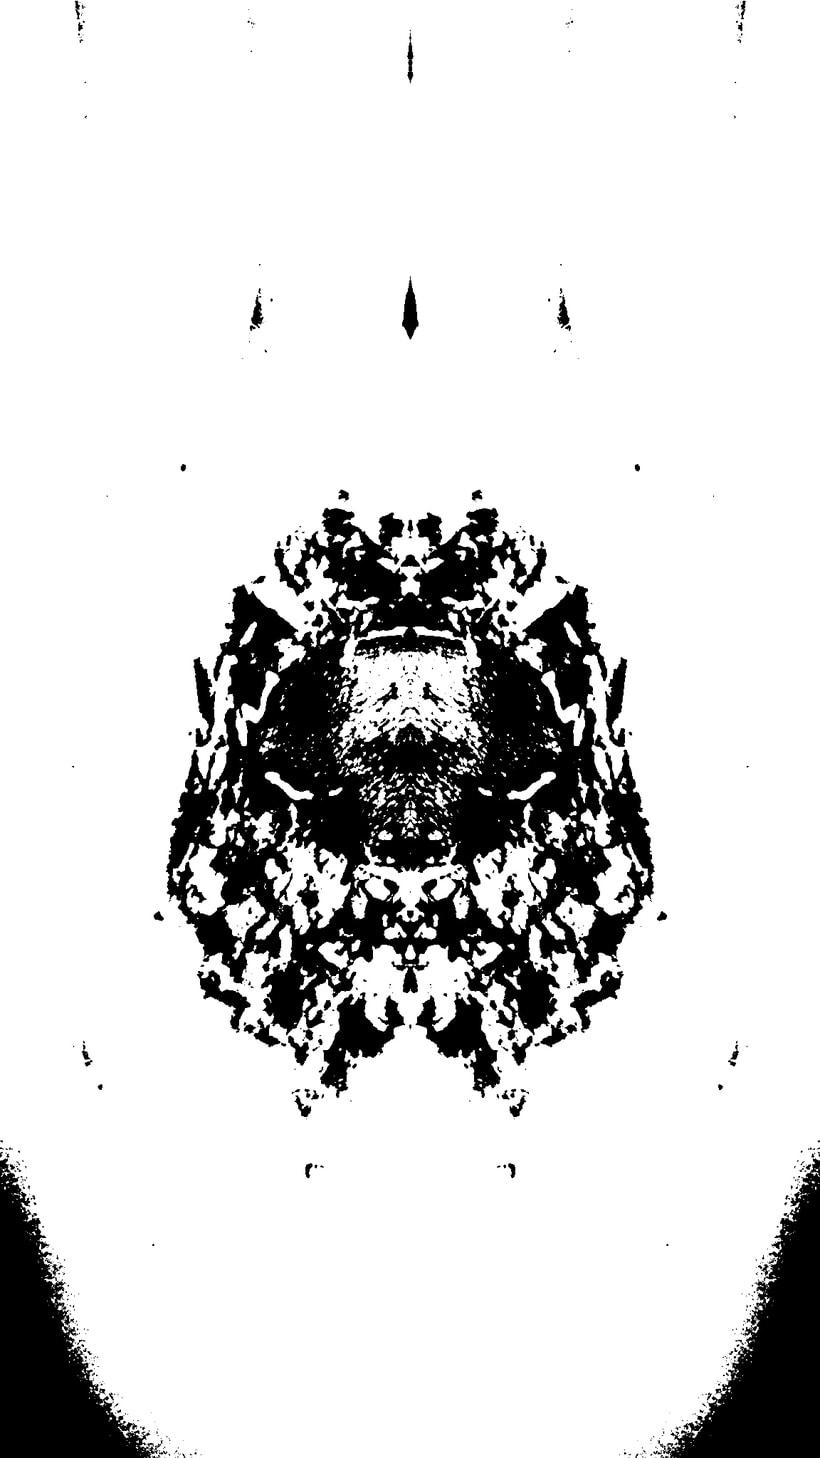 Imágenes ROSCHACH, múltiples lecturas. 11